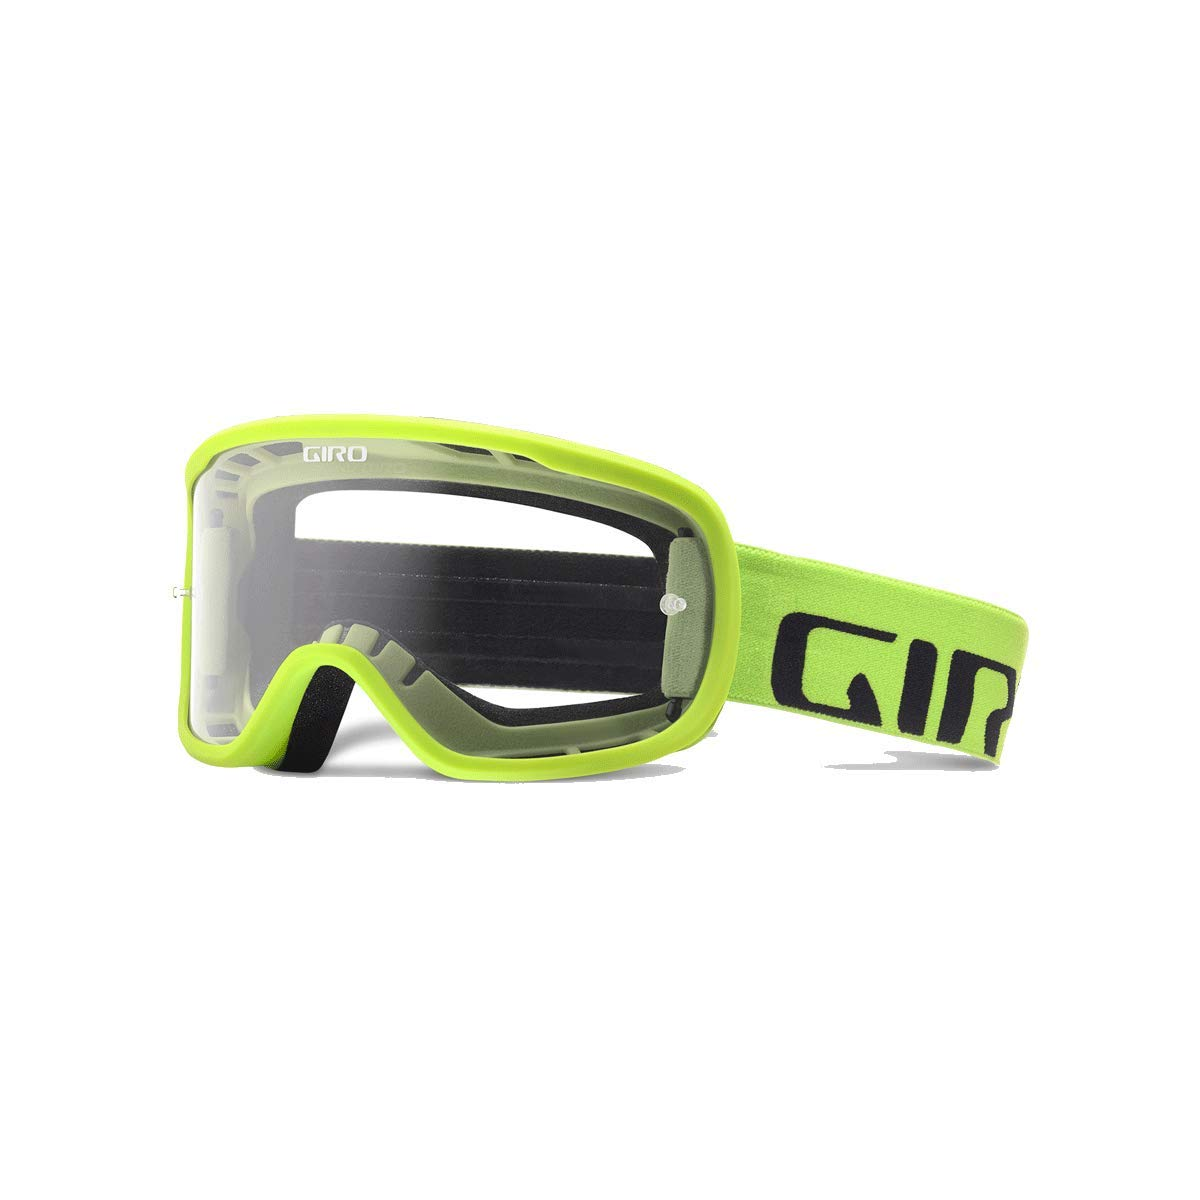 Giro Tempo MTB Bike Goggles GIGTEMP1